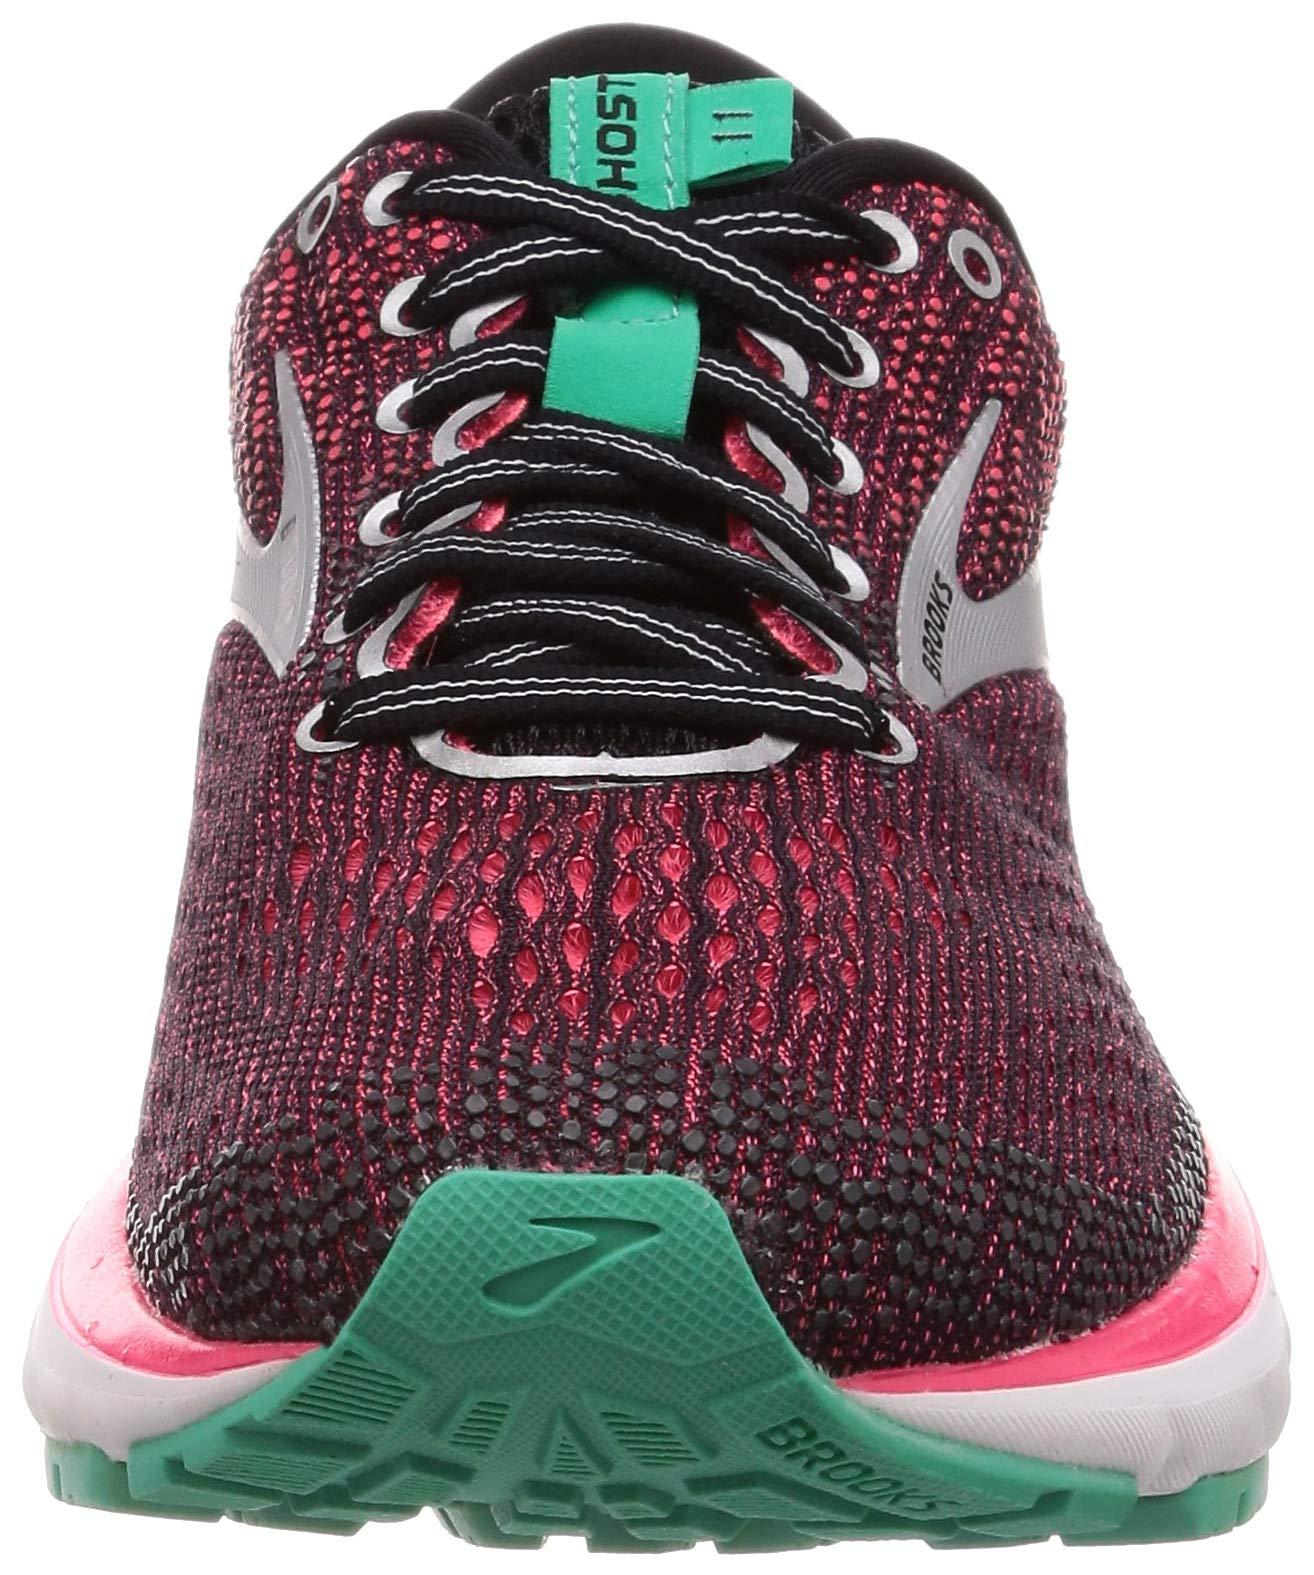 Brooks Womens Ghost 11 Running Shoe - Black/Pink/Aqua - D - 5.0 by Brooks (Image #4)